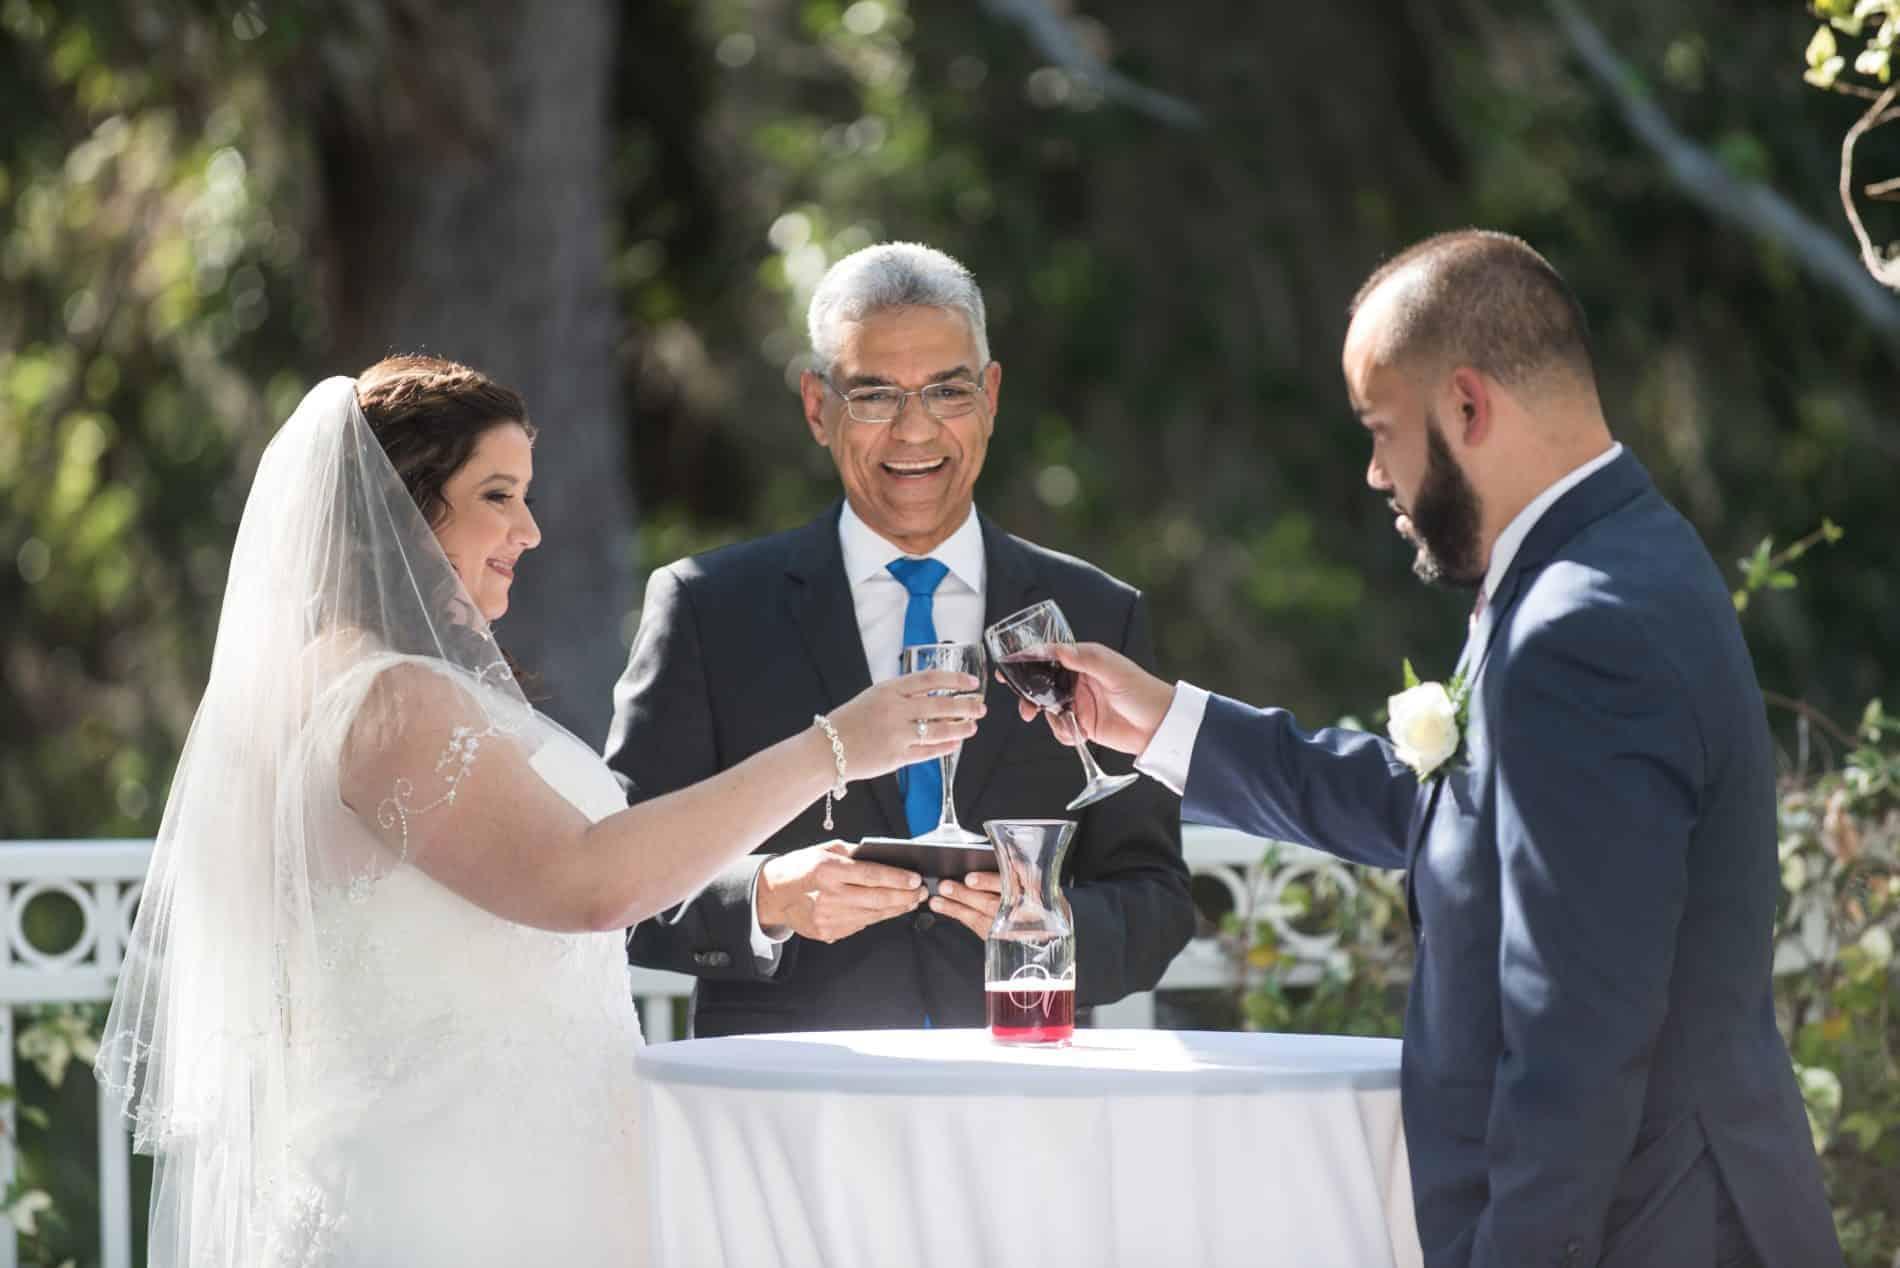 Wine Ceremony at this Italian Outdoor Wedding